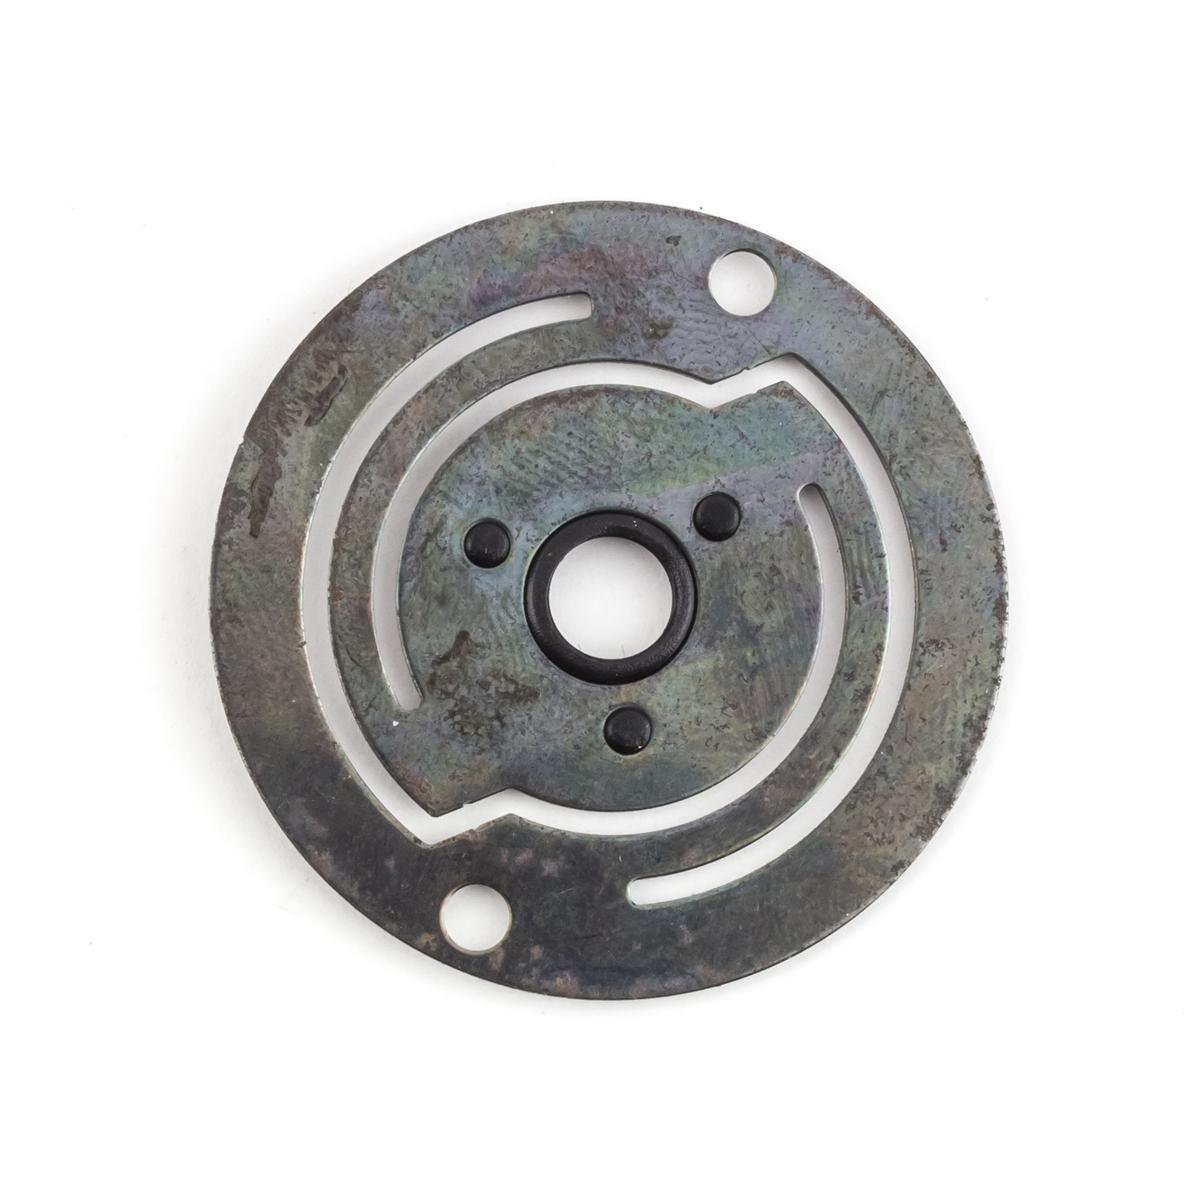 GE Corometrics Nautilus 2264HAX 2264LAX TOCO Transducer Metal Disc & Plastic Insert